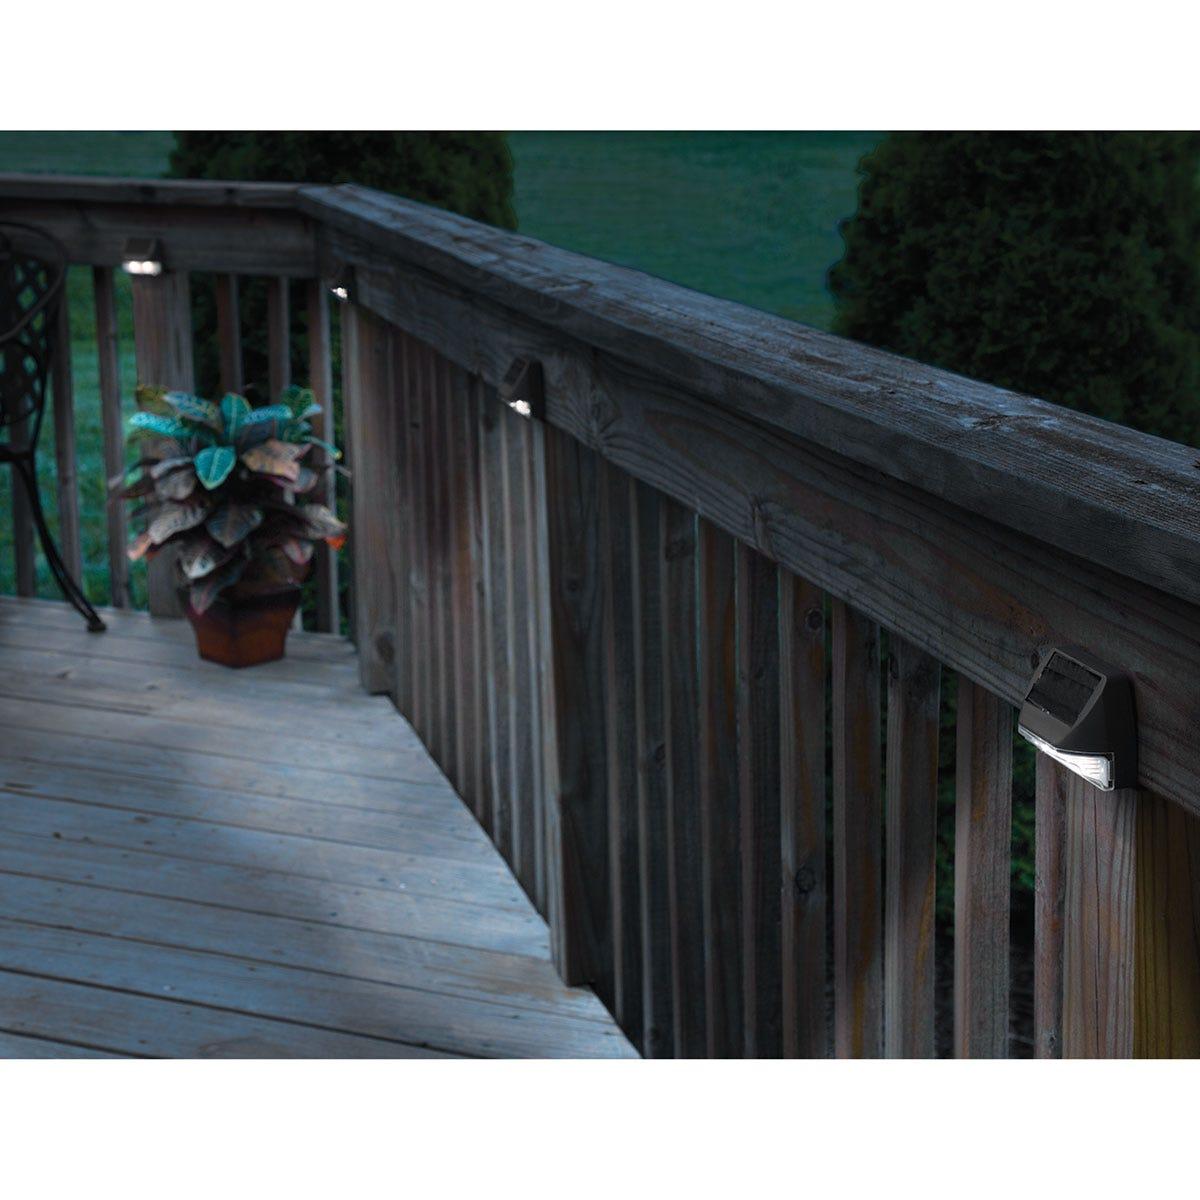 Solar deck post lights set of 4 from sporty 39 s tool shop - Solar deck lights for steps ...